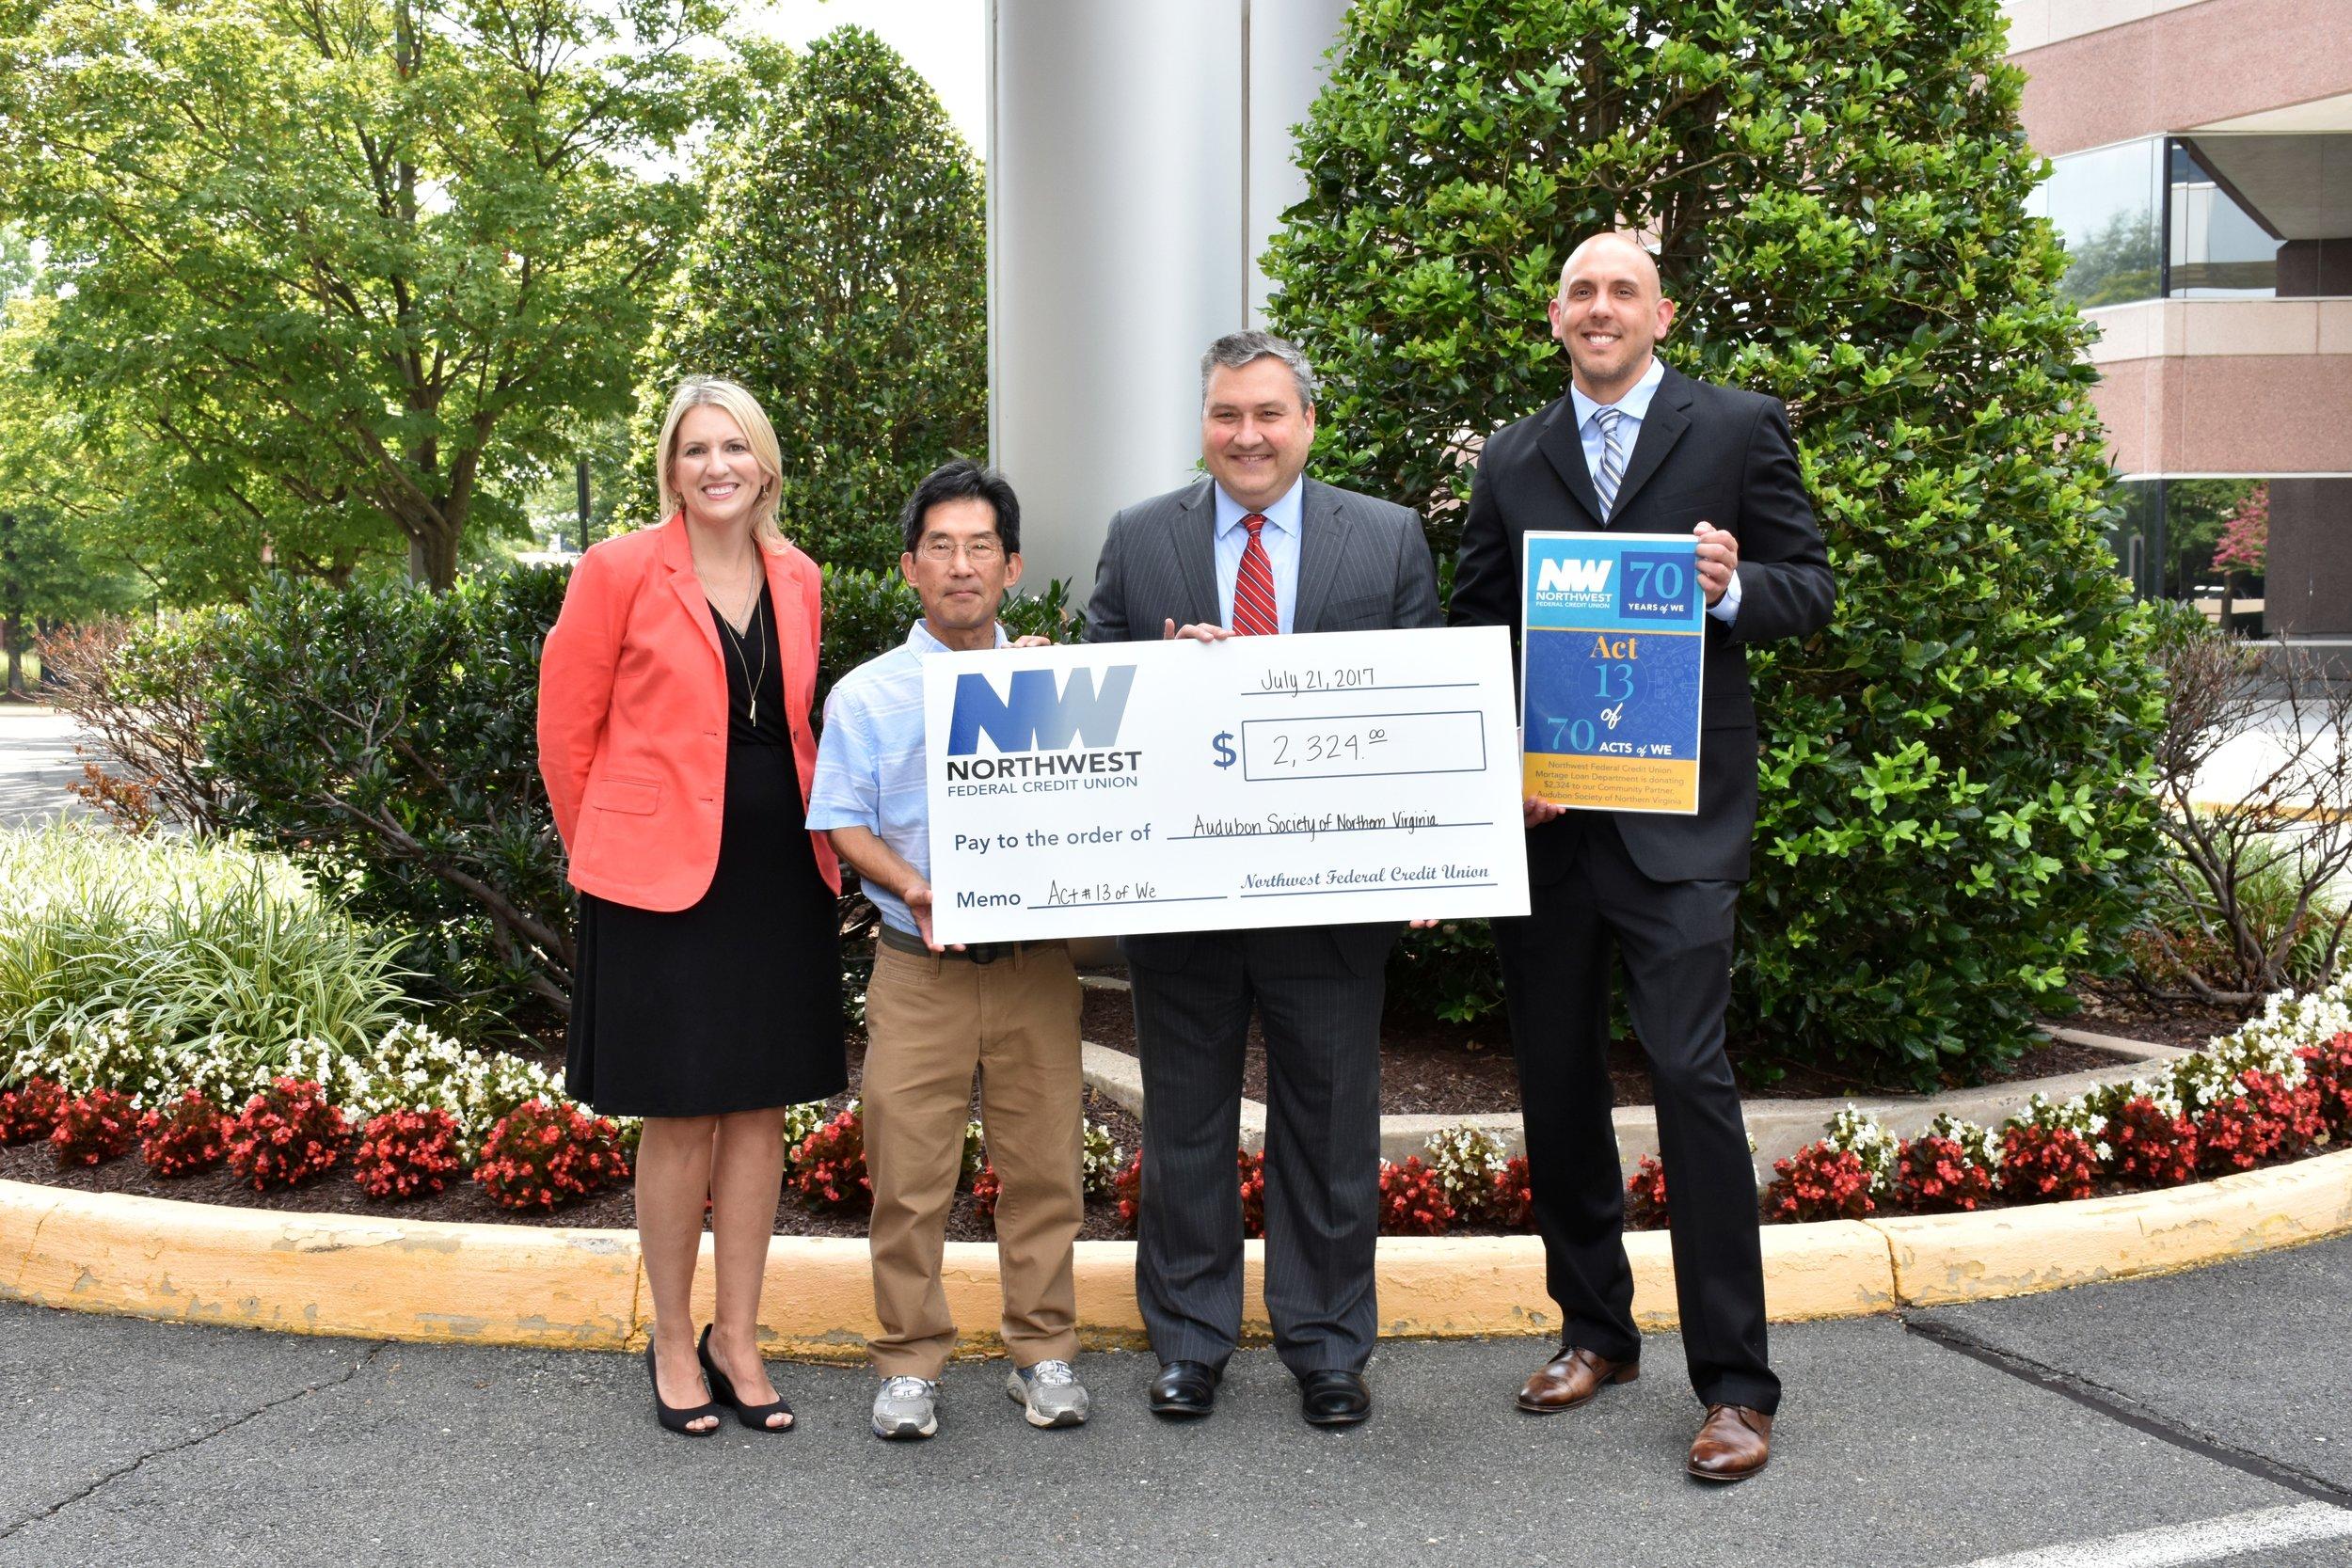 Carl Kikuchi Receiving Donation from Northwest Federal Credit Union